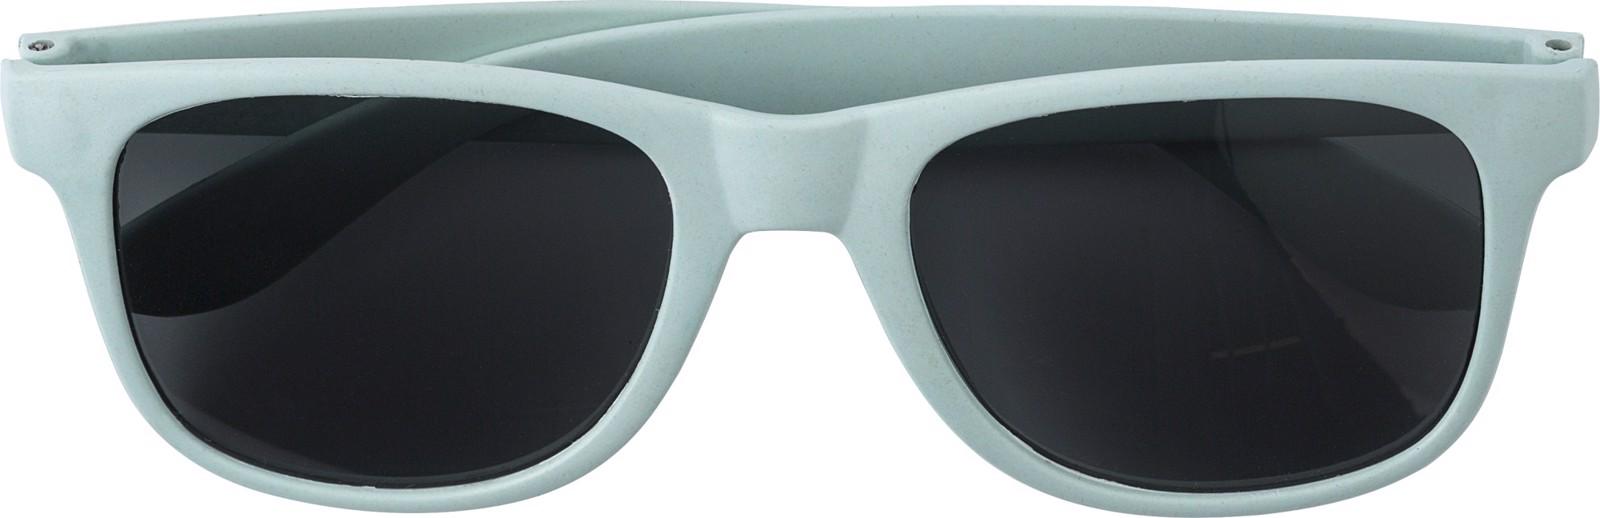 Bamboo fibre sunglasses - Green